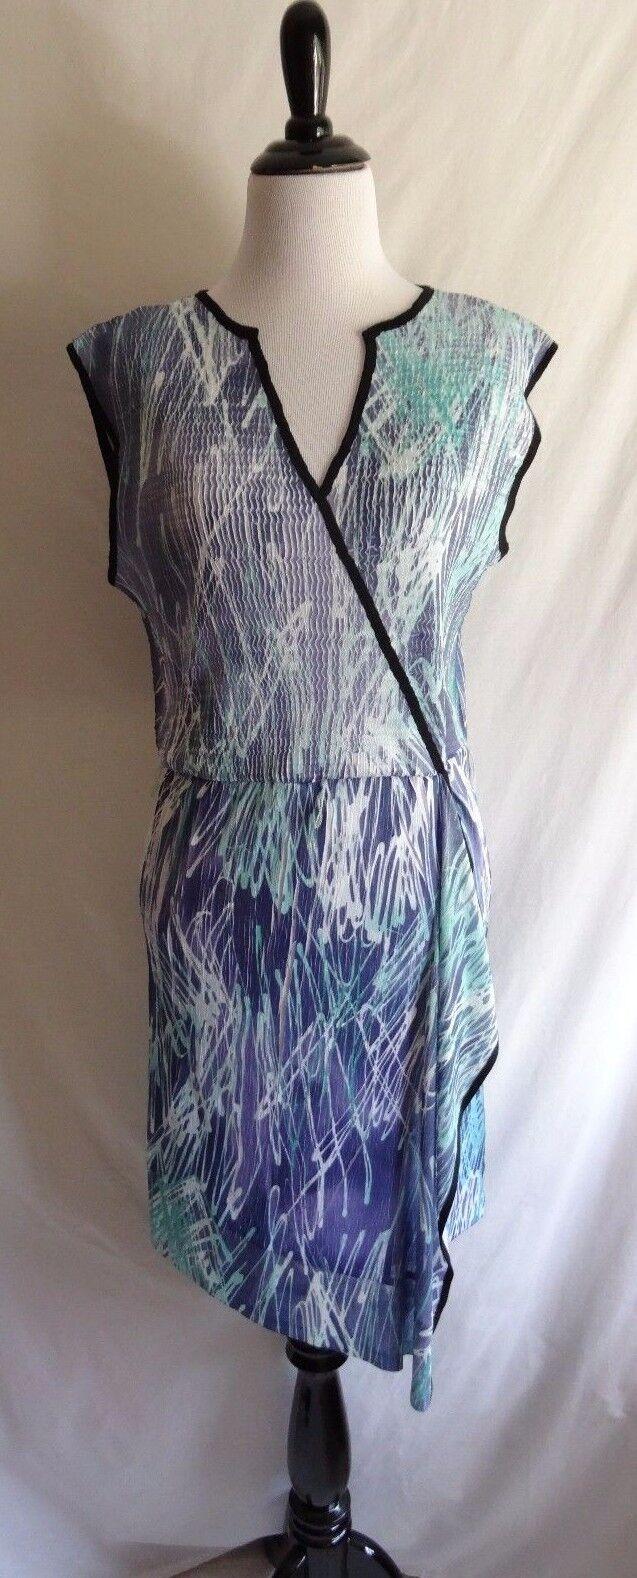 Komarov L bluee Artsy Abstract Charmeuse Crinkle Career Faux Wrap Draped Dress